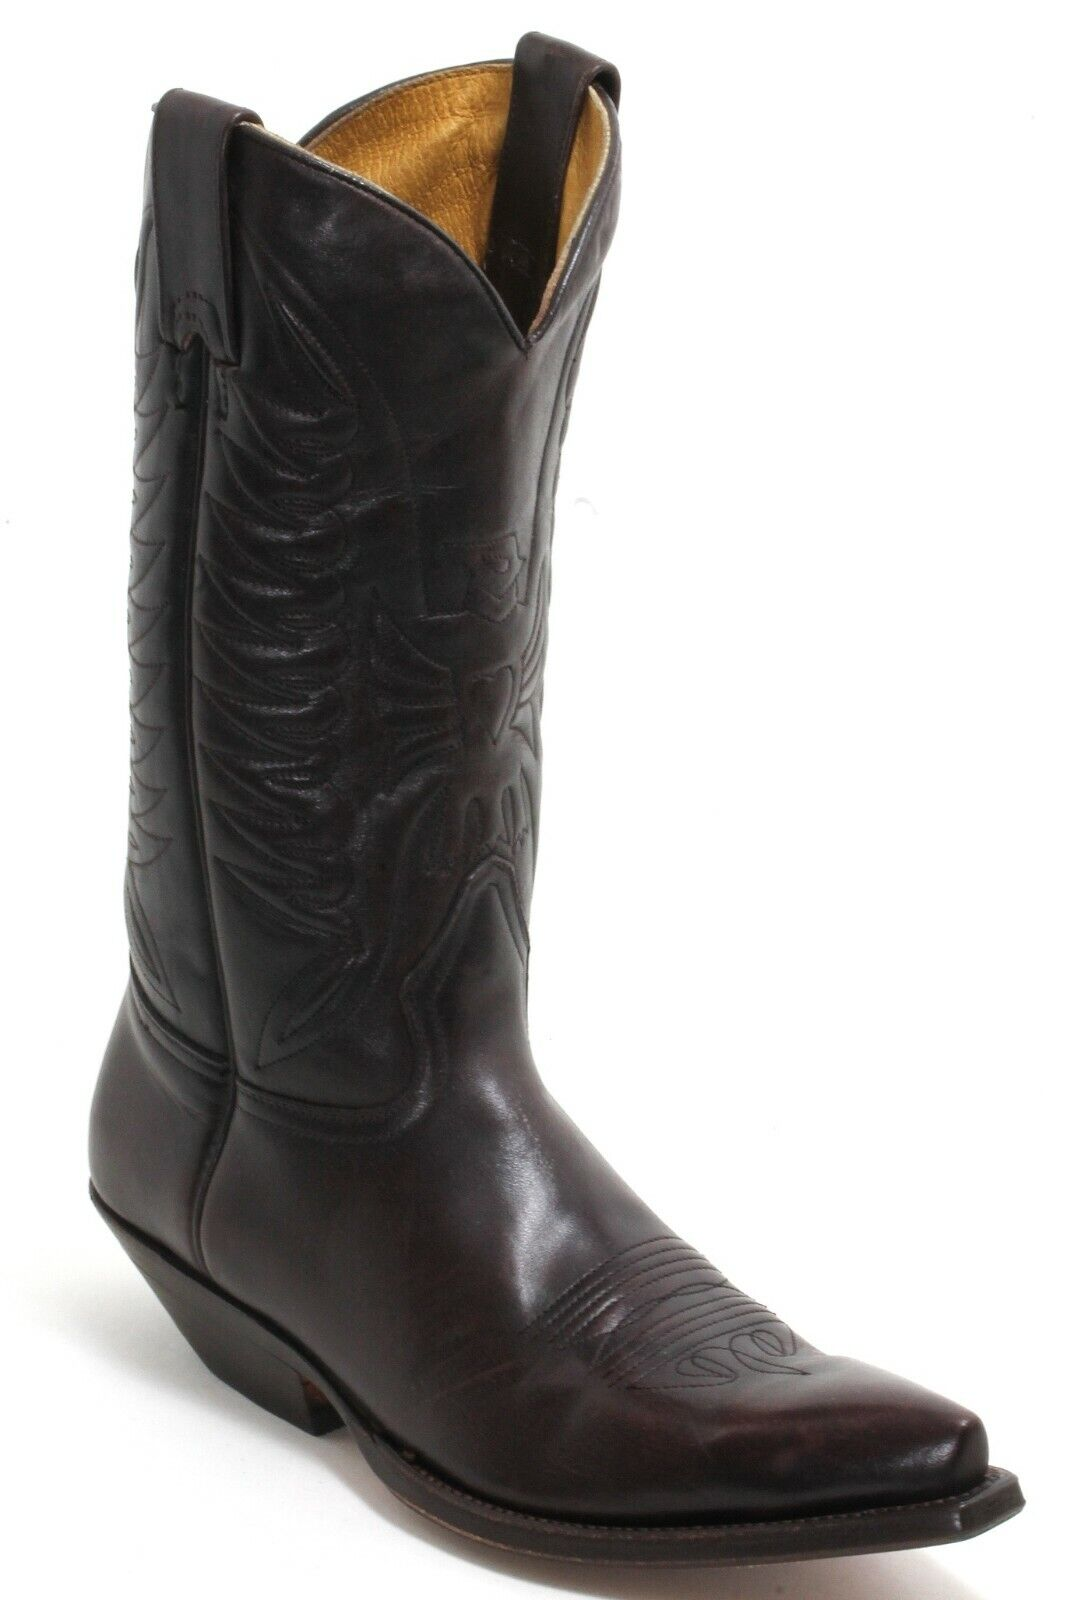 Western Bottes Bottes De Cowboy catalan Style Line Dance Buffalo 1040 613 37,5 - 38